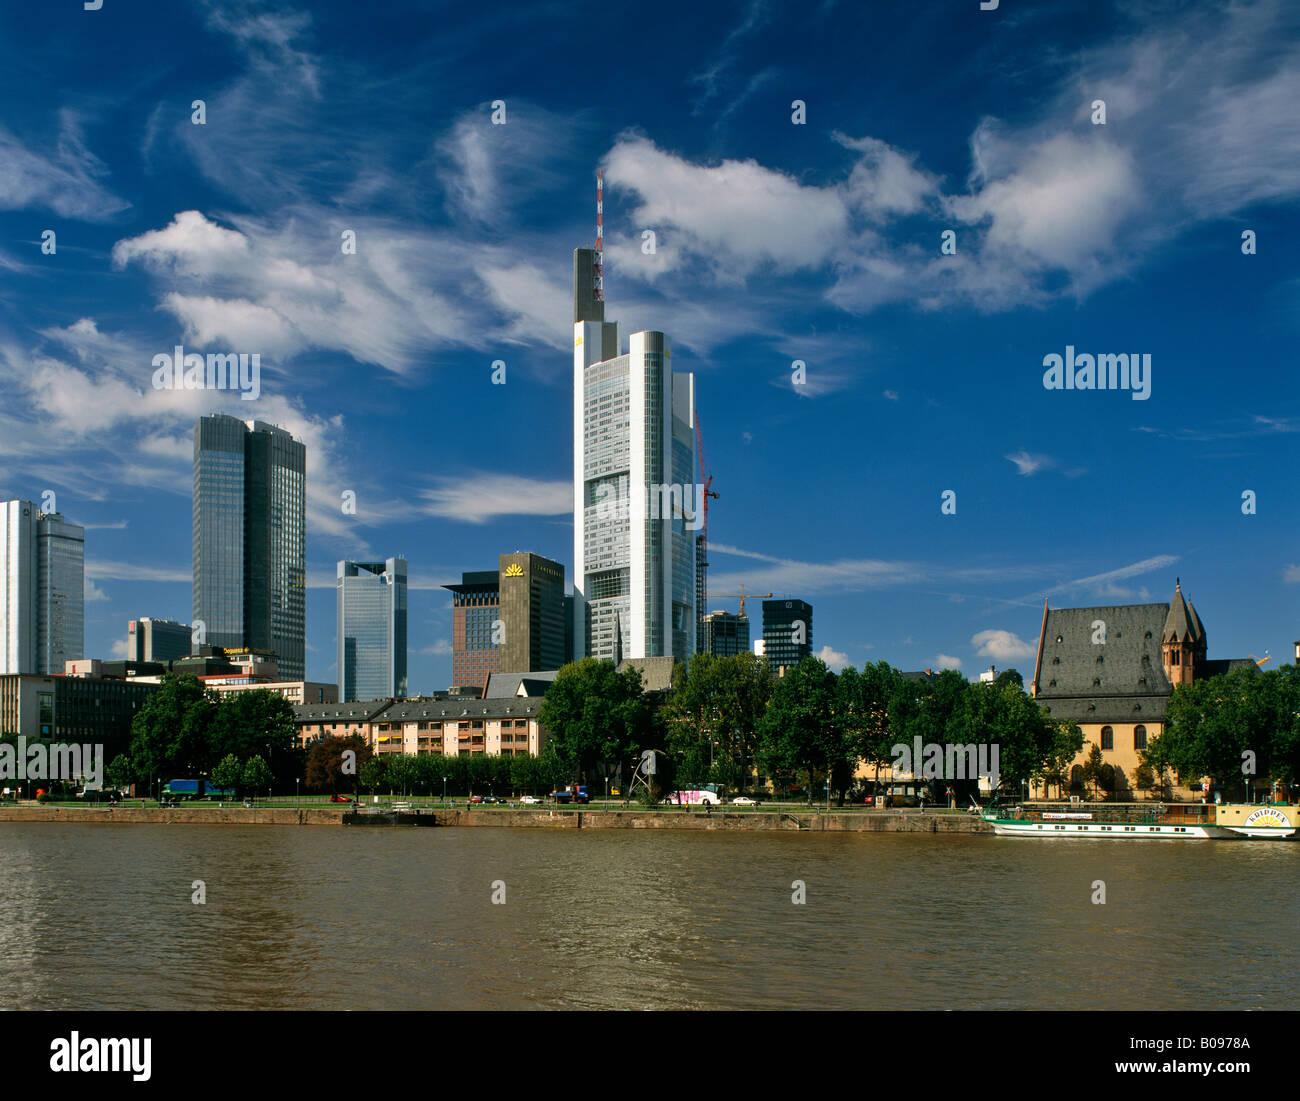 Skyline, Banking Quarter, Frankfurt, Germany - Stock Image